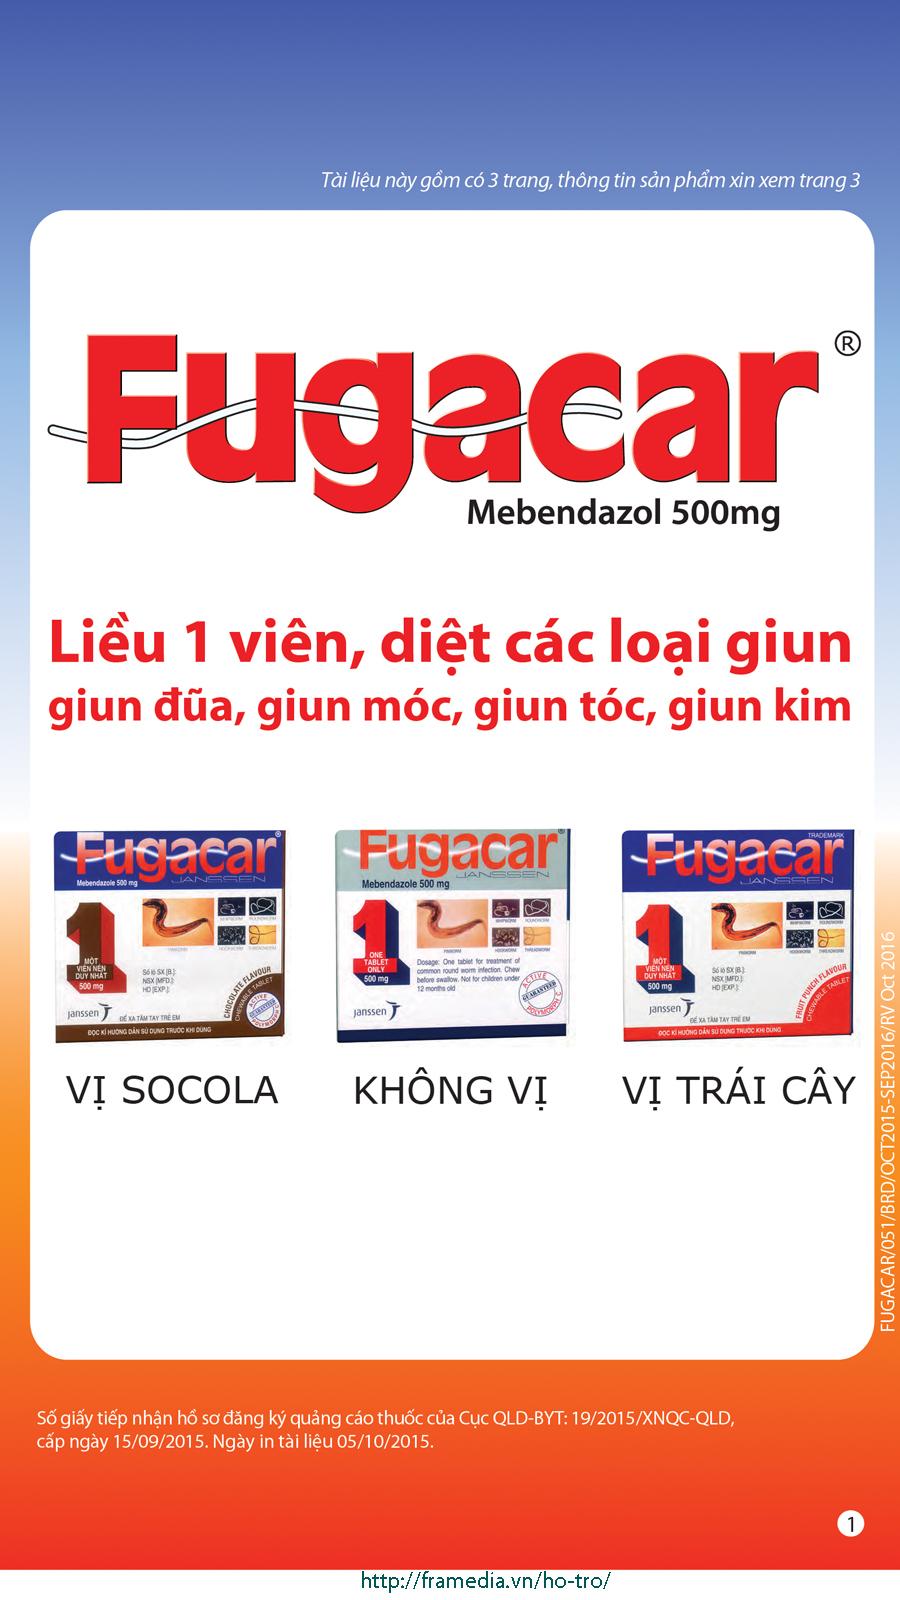 FugacarKV_frame1_270x480